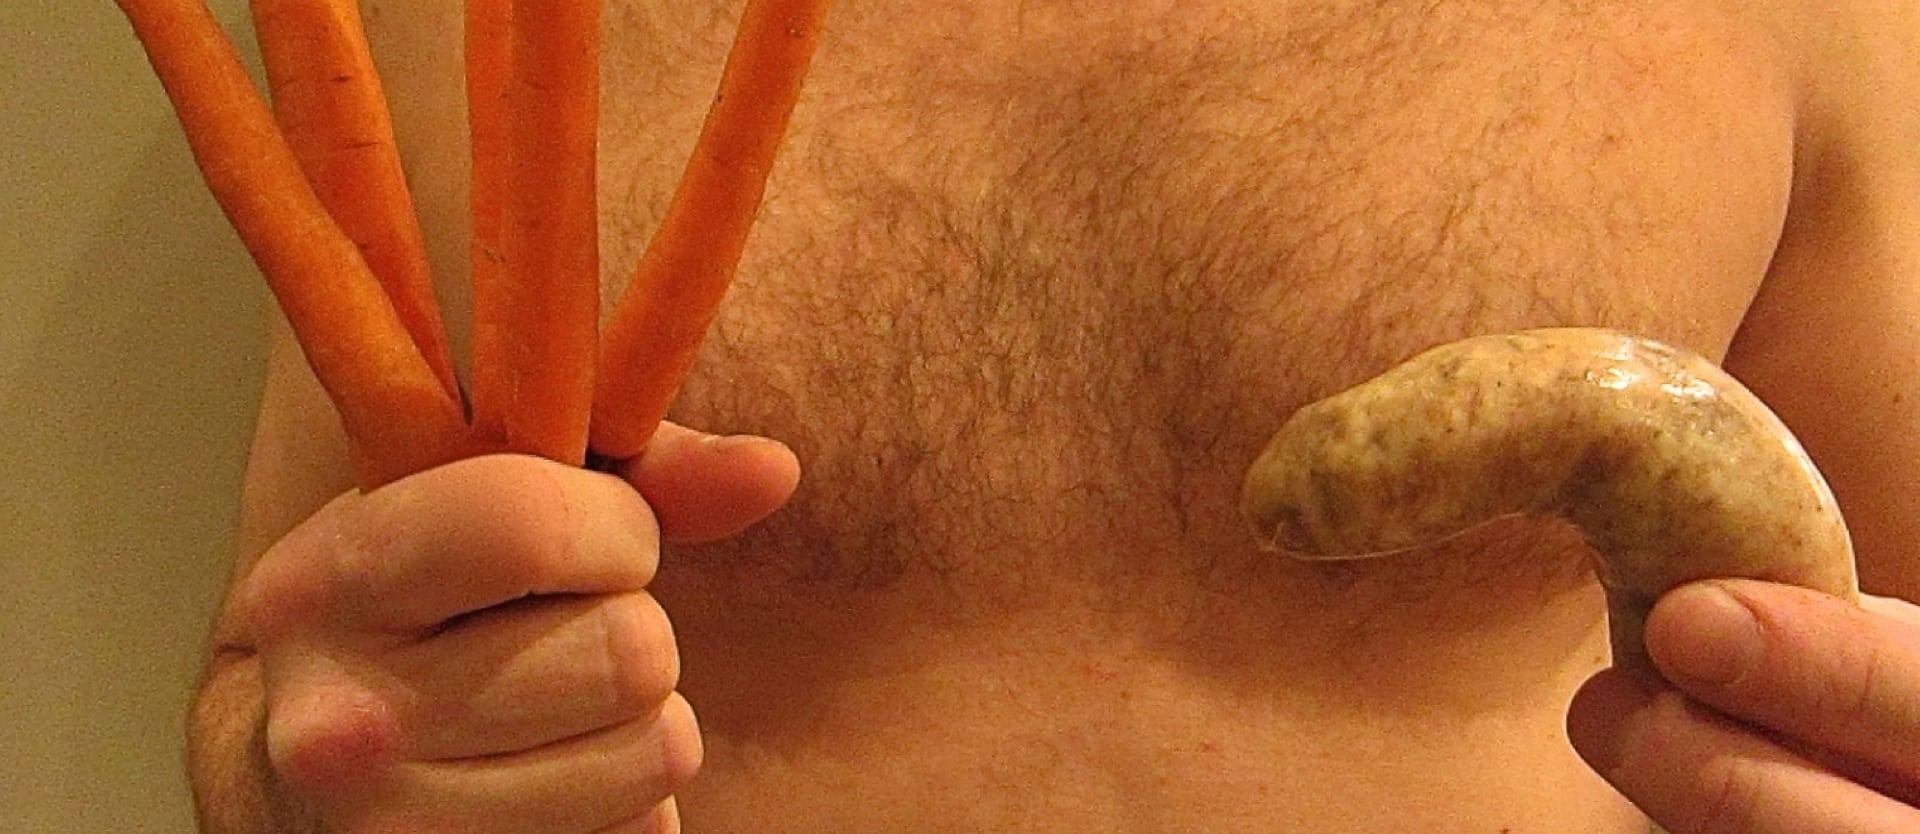 Video of penis erecting